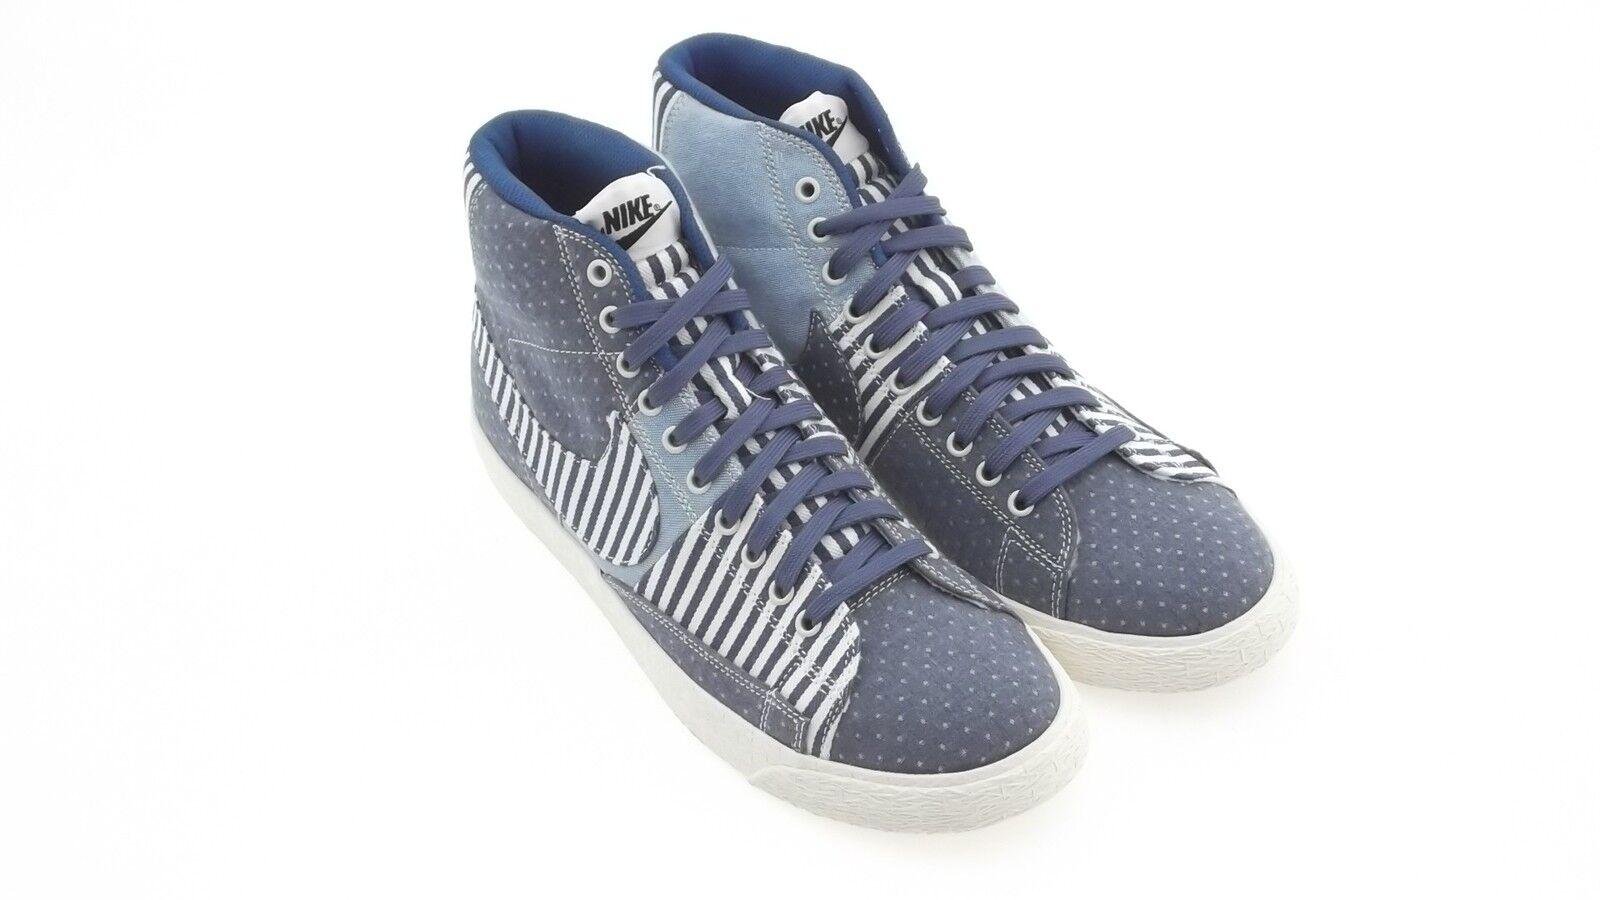 638322-402 Nike Men Nike Blazer Mid Premium Vintage QS denim patchwork shoes